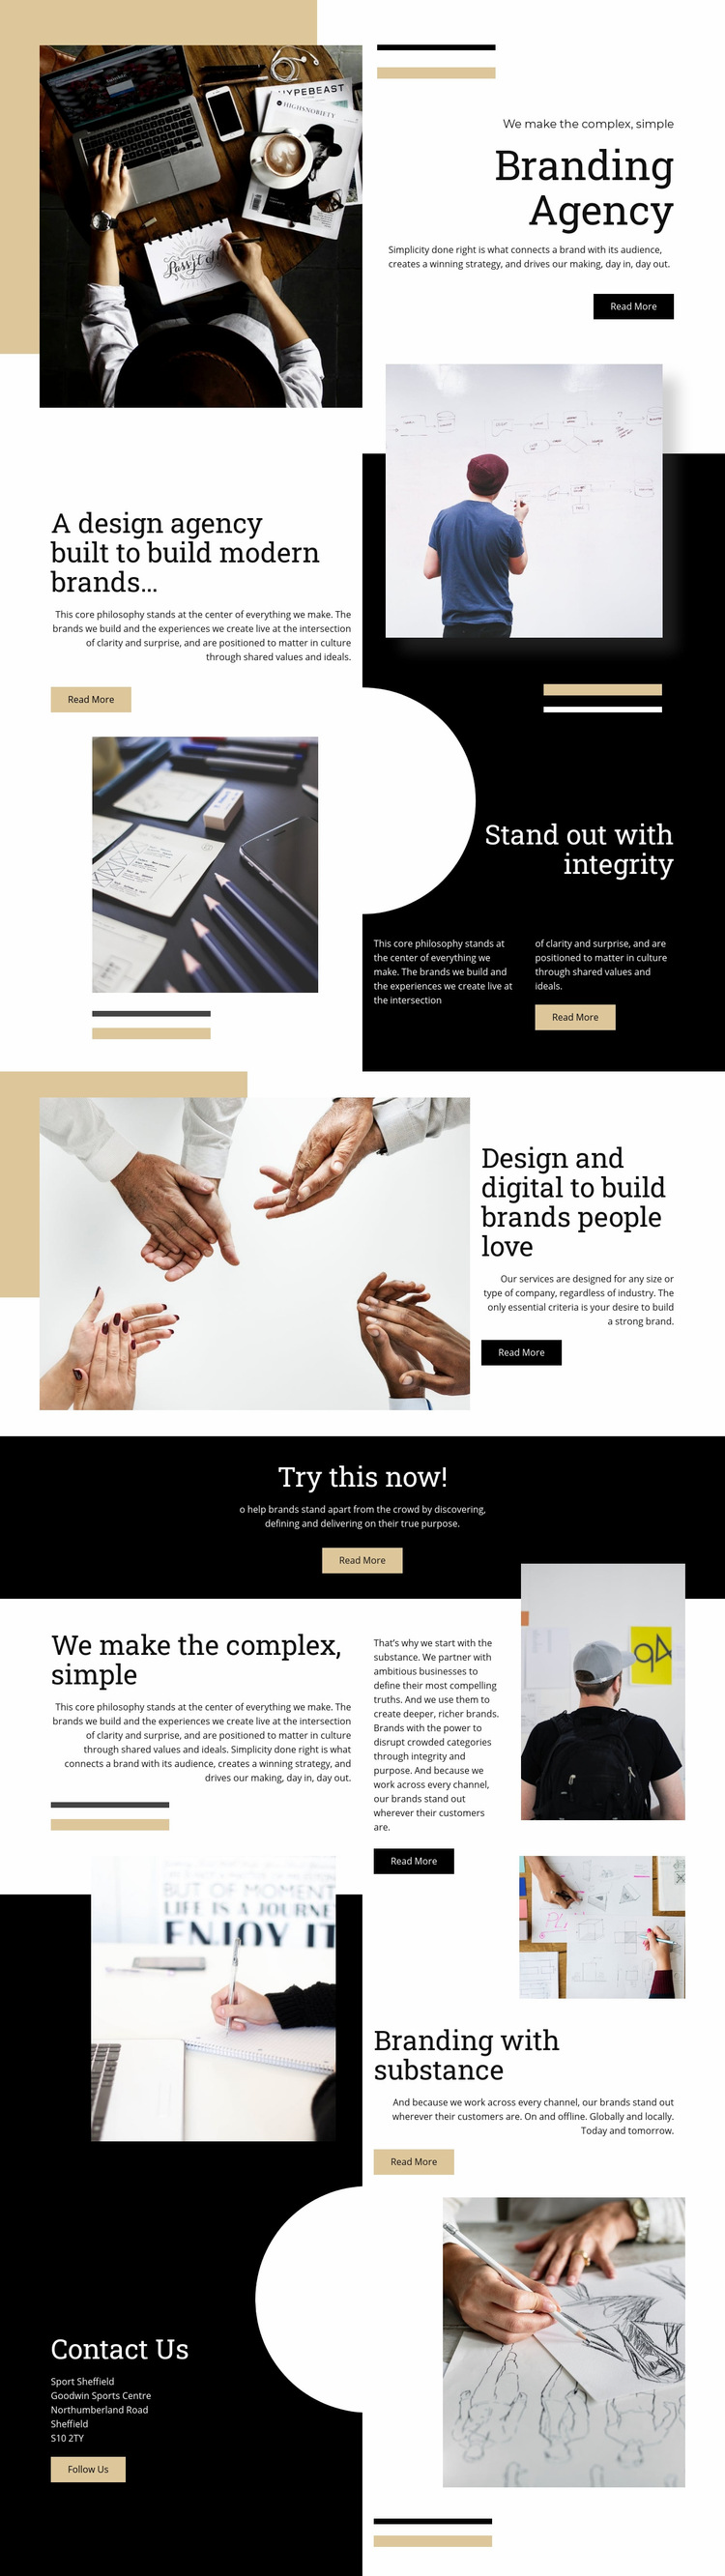 Branding Agency Web Page Design